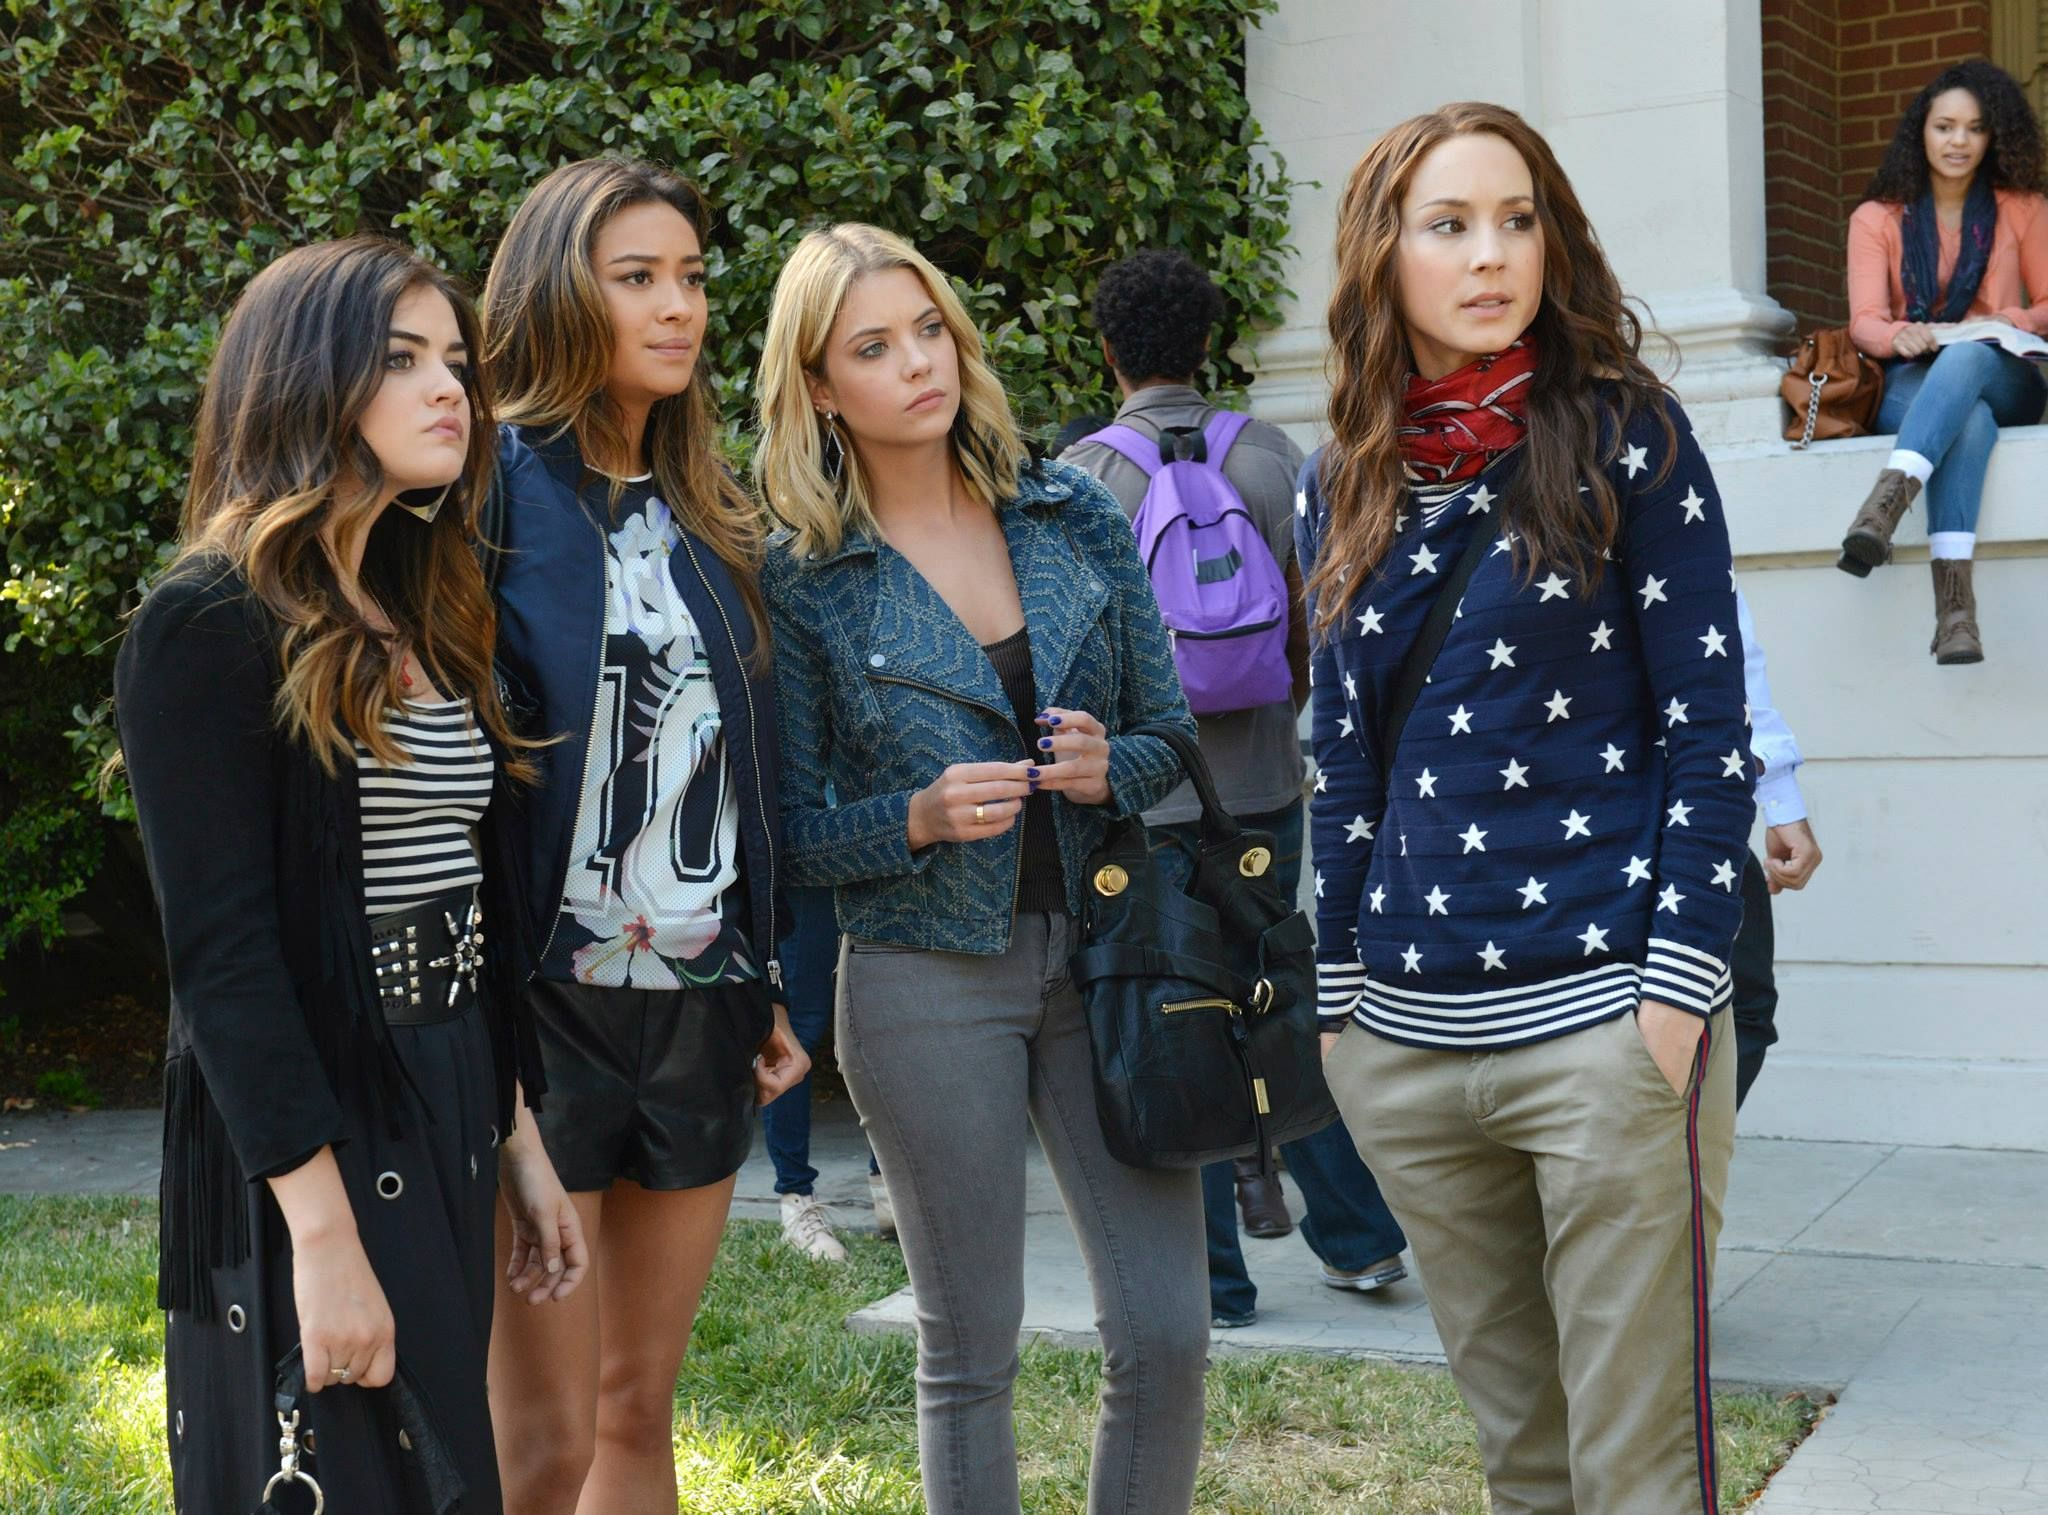 Pretty little liars Season 5 episode 5: